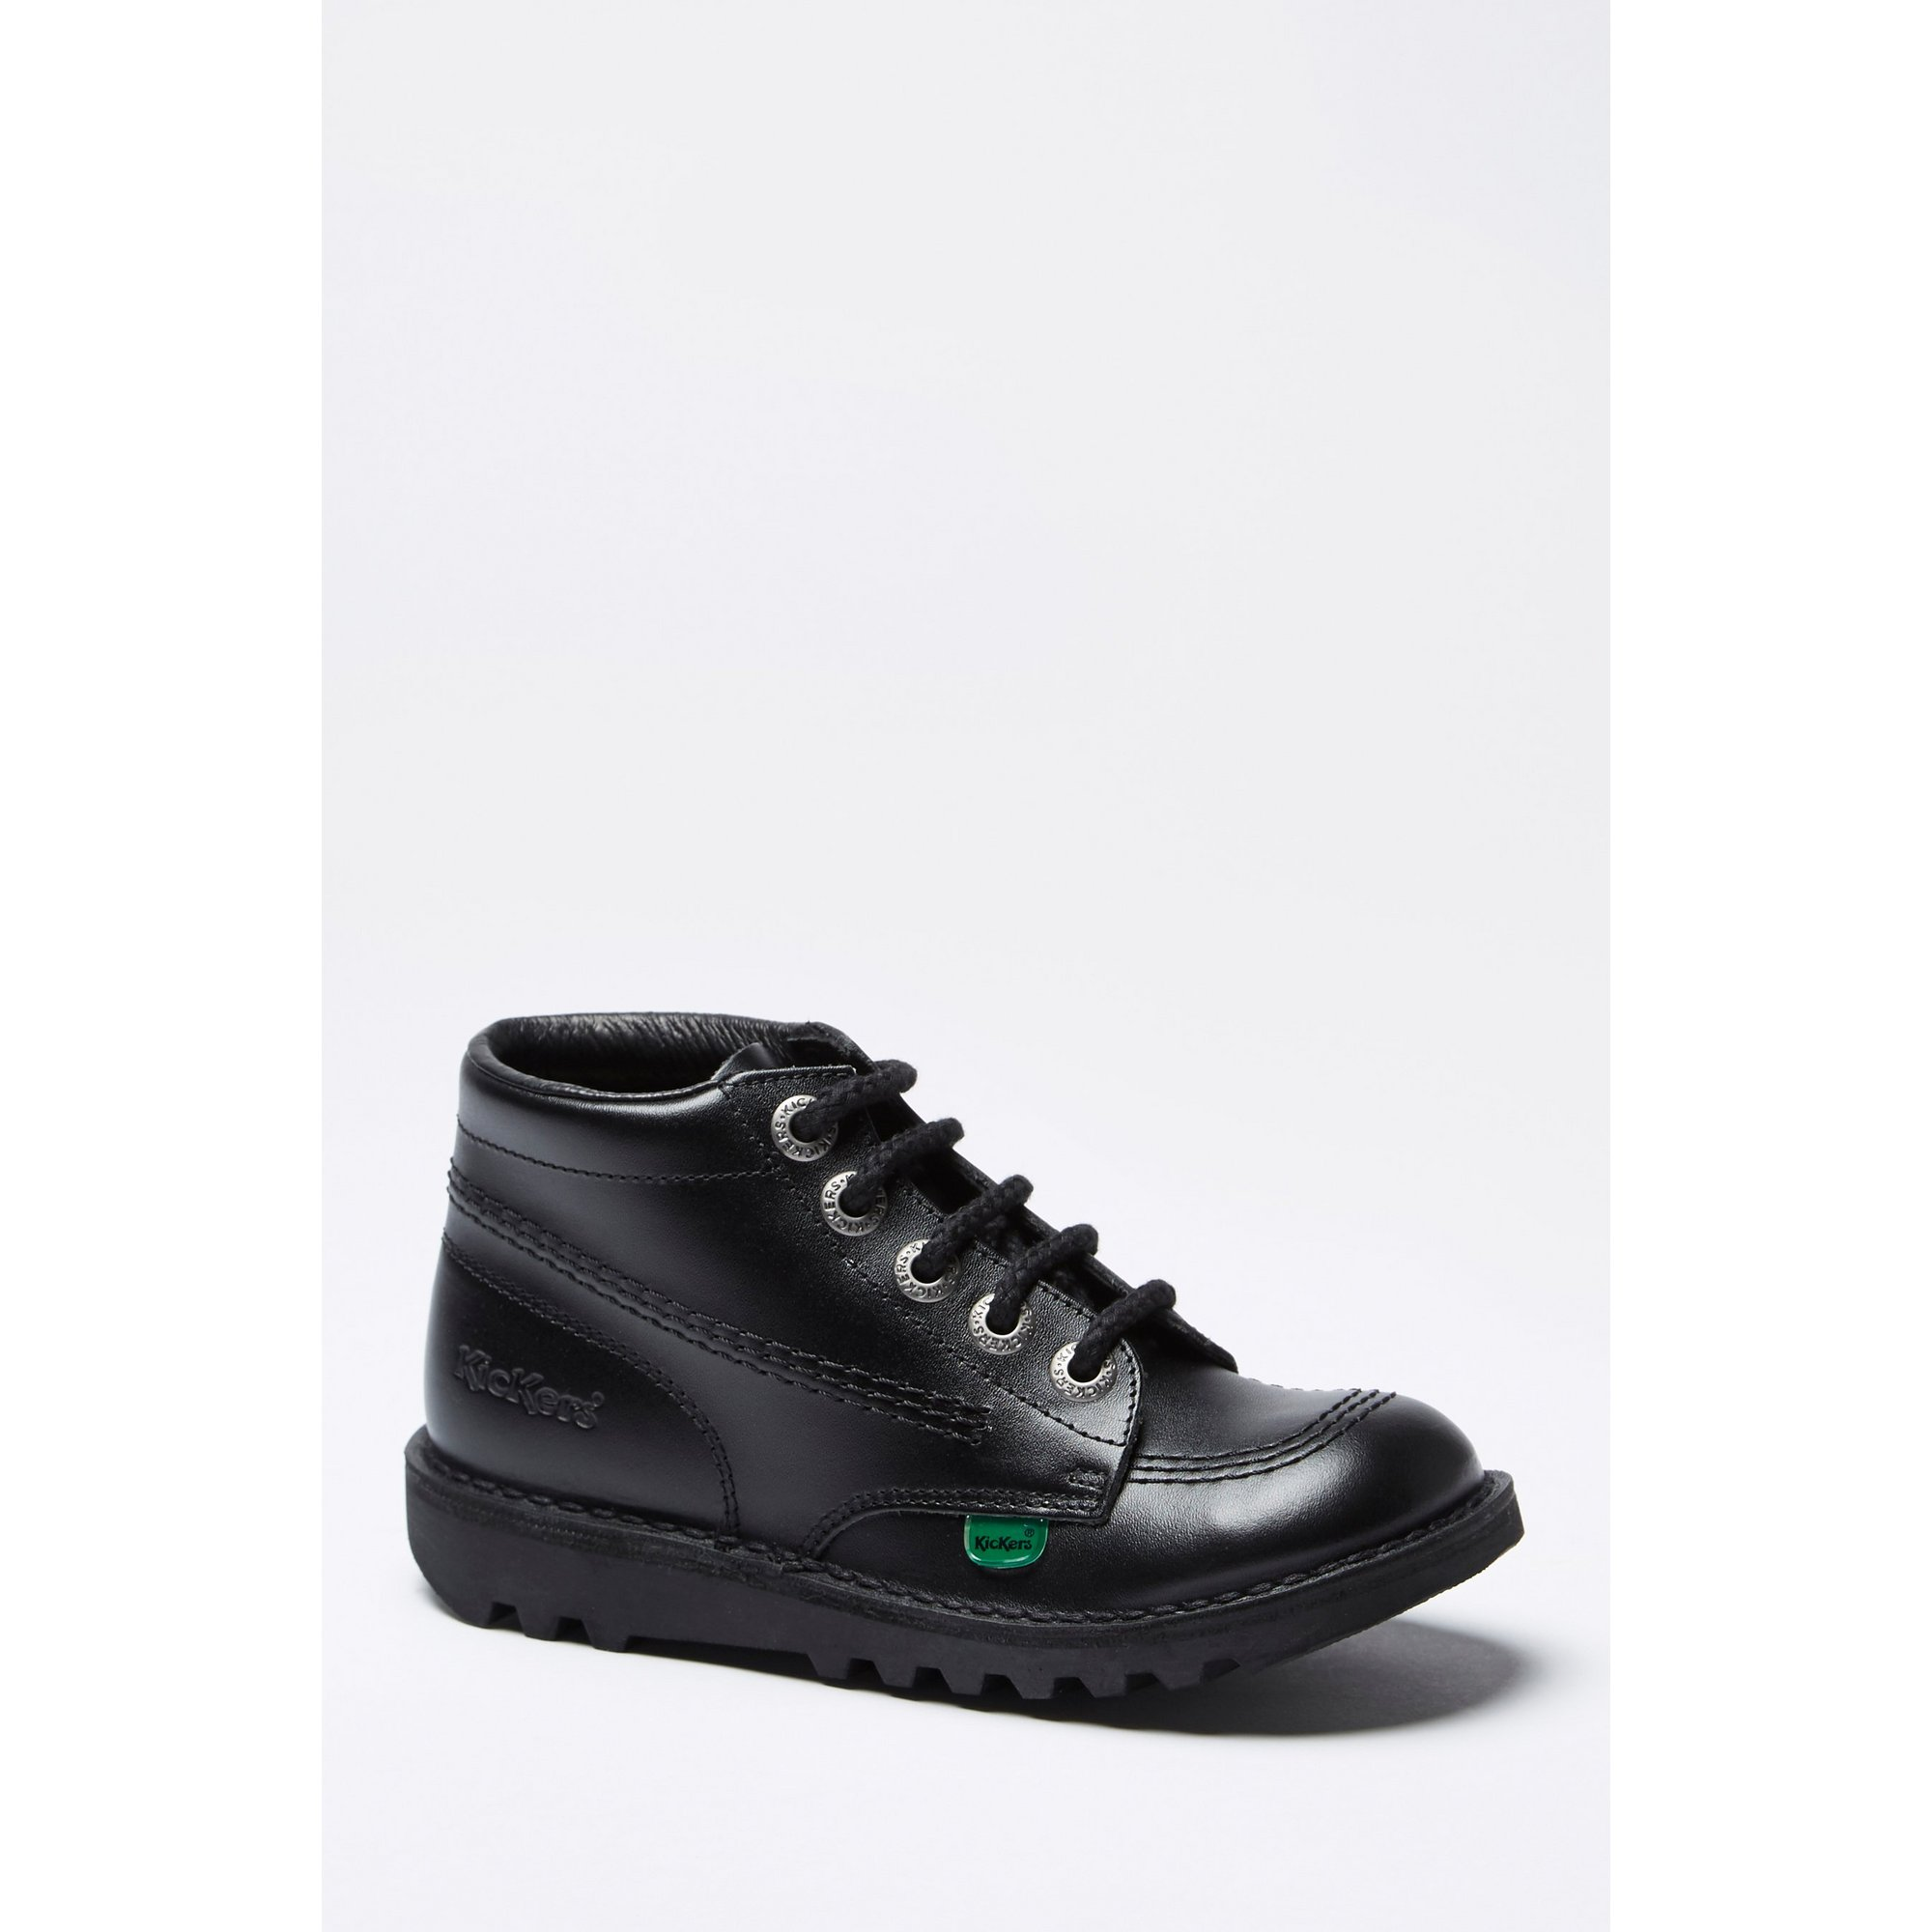 Image of Unisex Kickers Kick Hi Boots